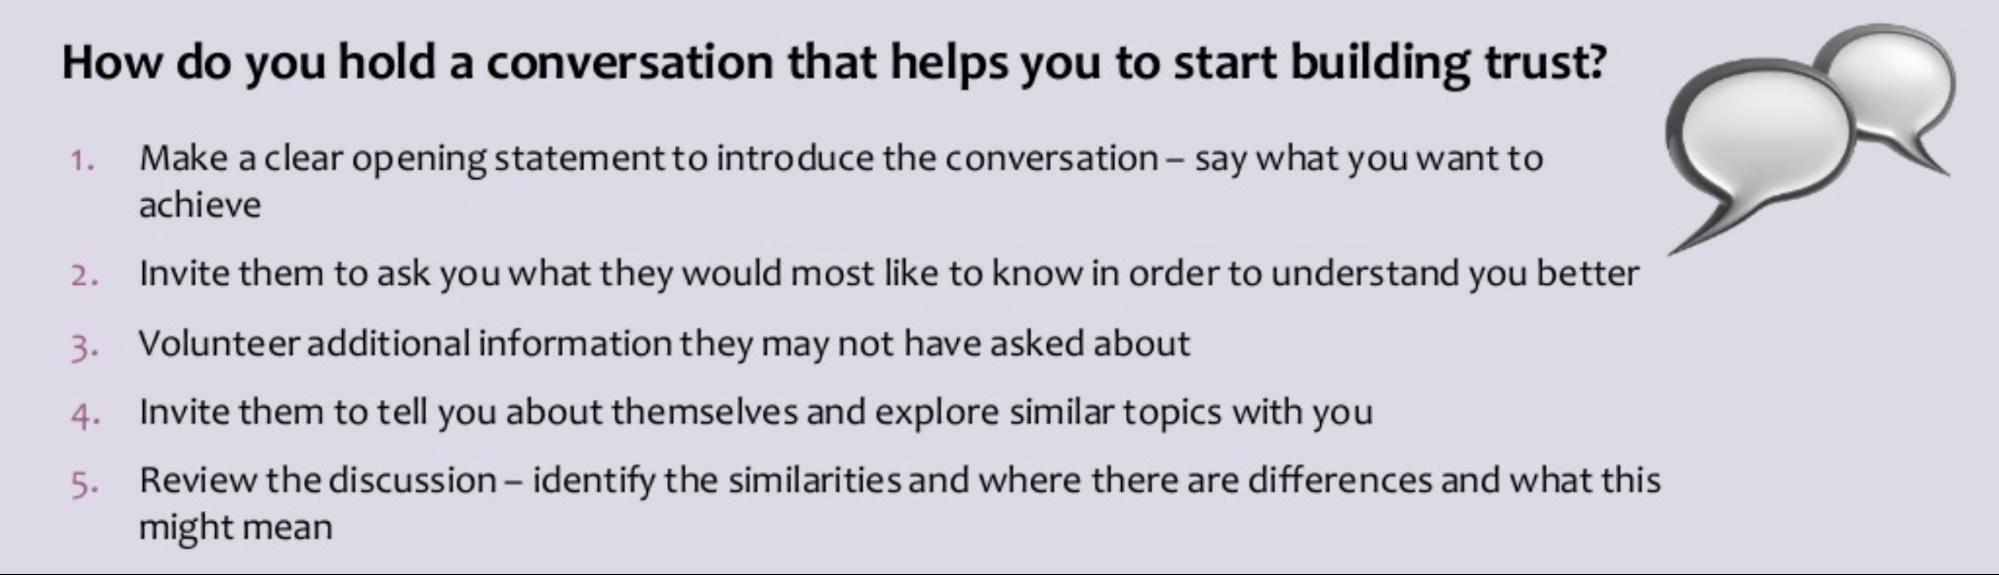 hold a conversation